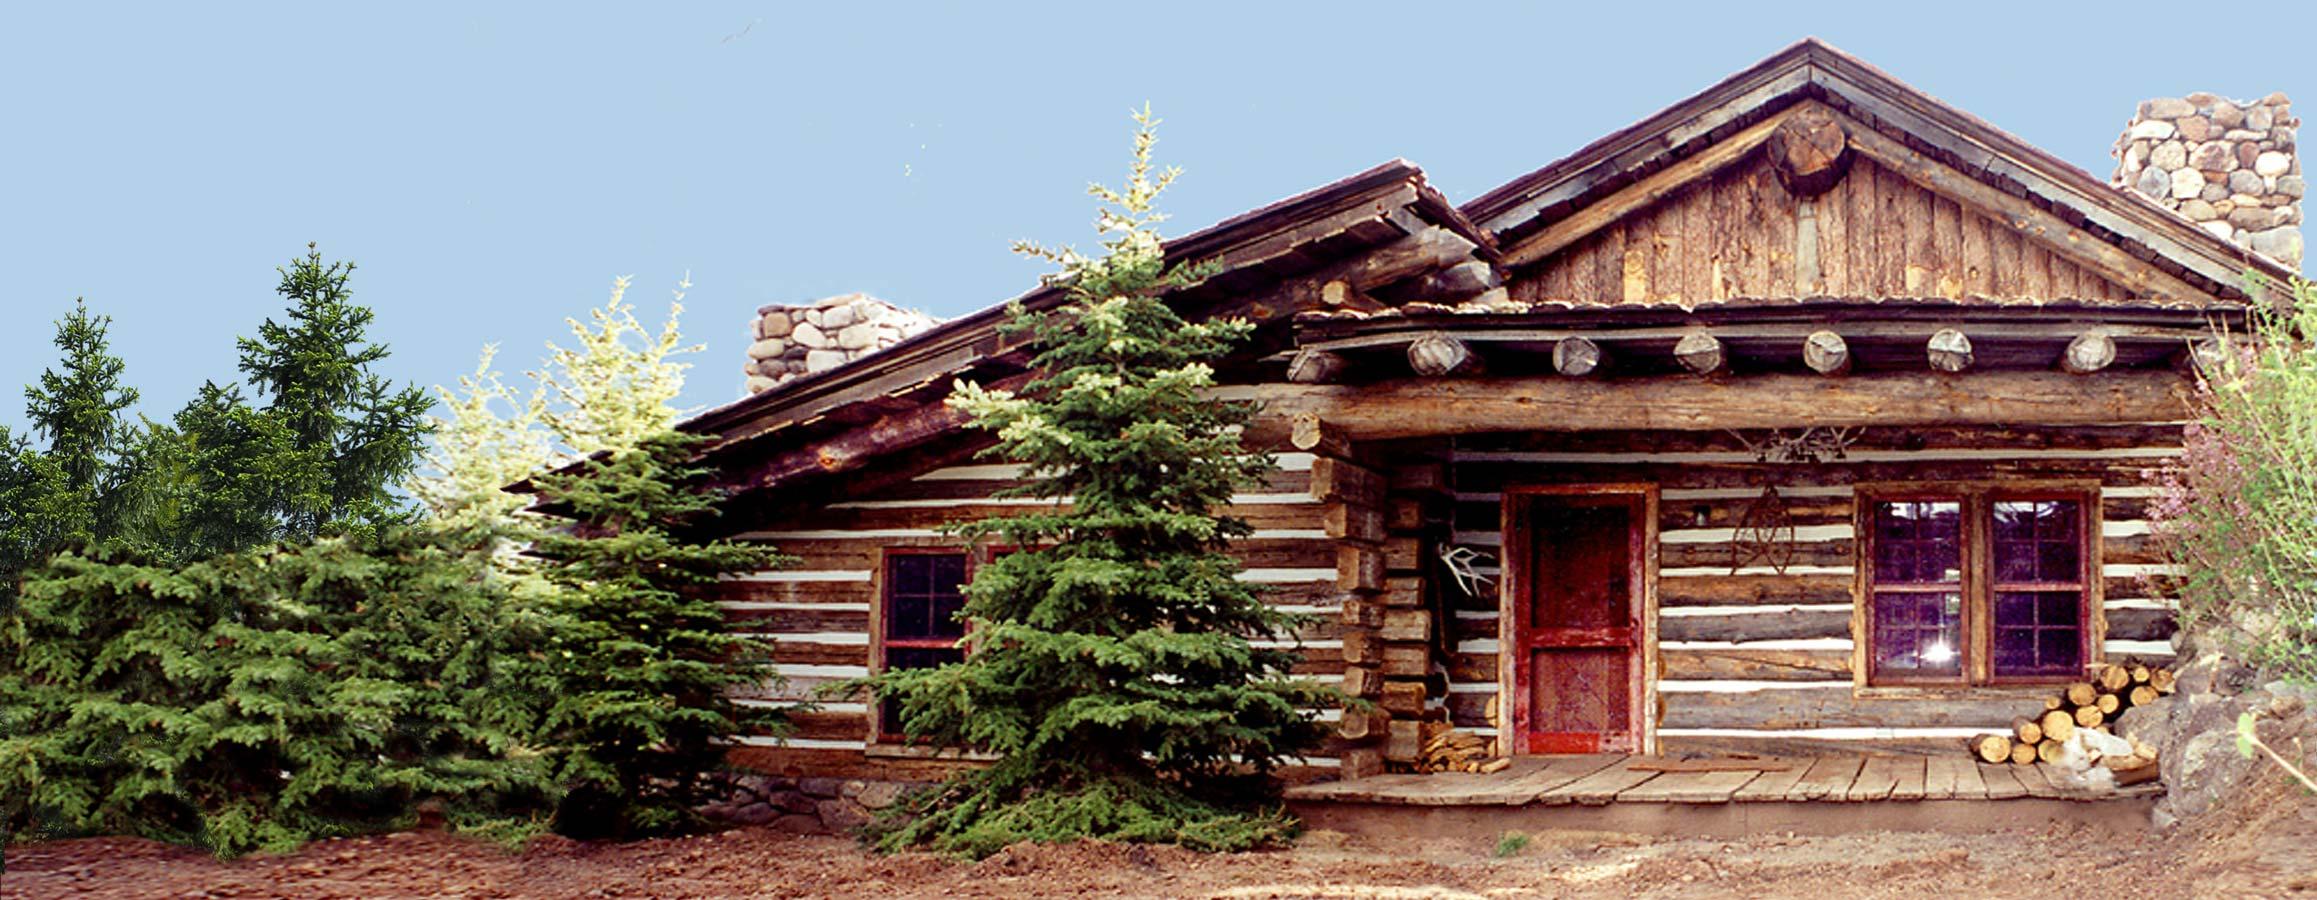 Ralph Lauren Ranch Ridgeway Co Ewing Architects